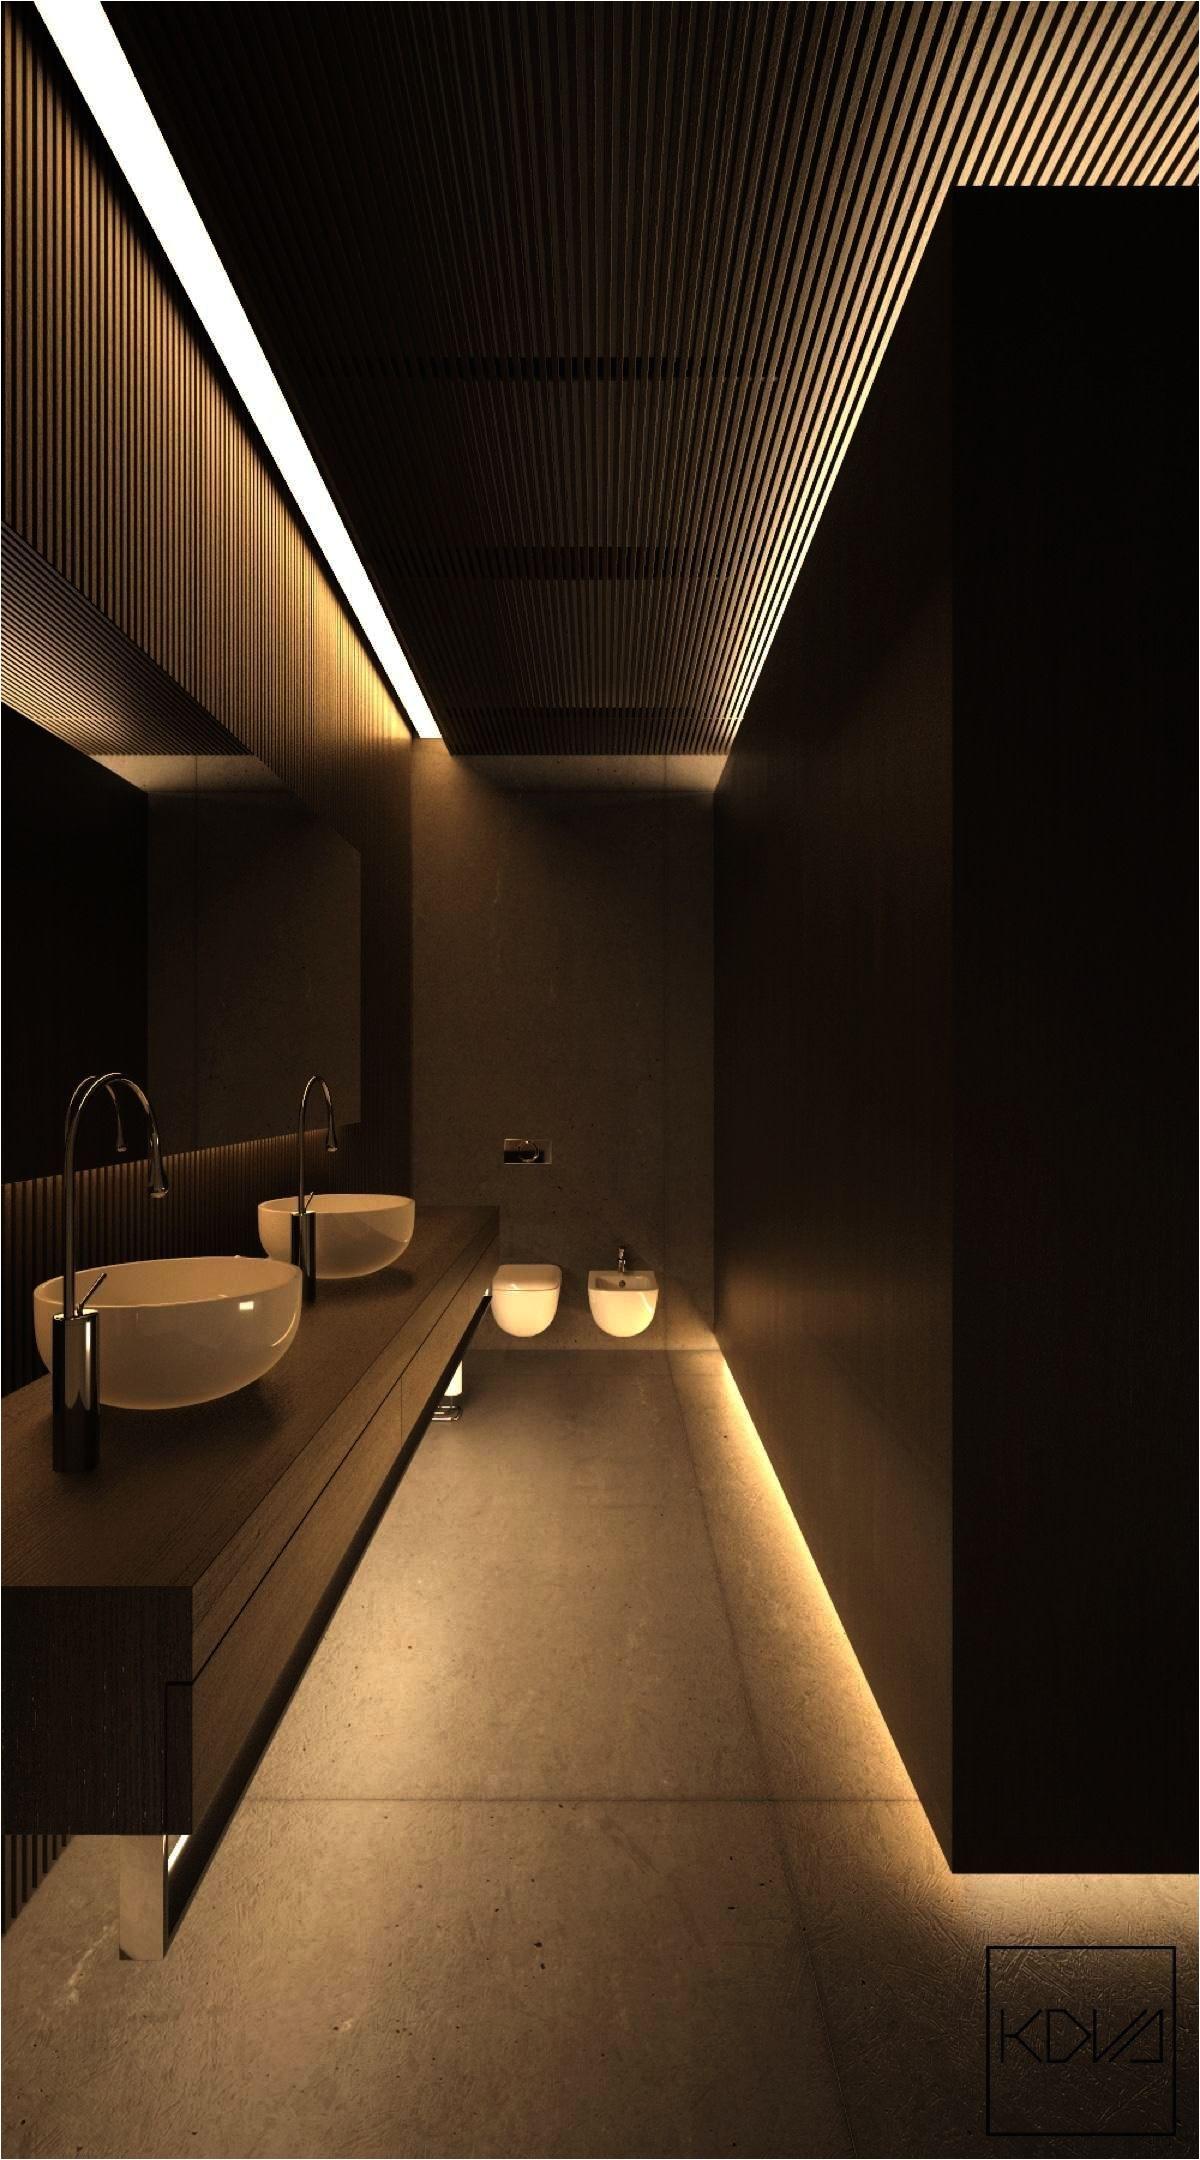 Get some Elegant Bathrooms merce Street Glasgow